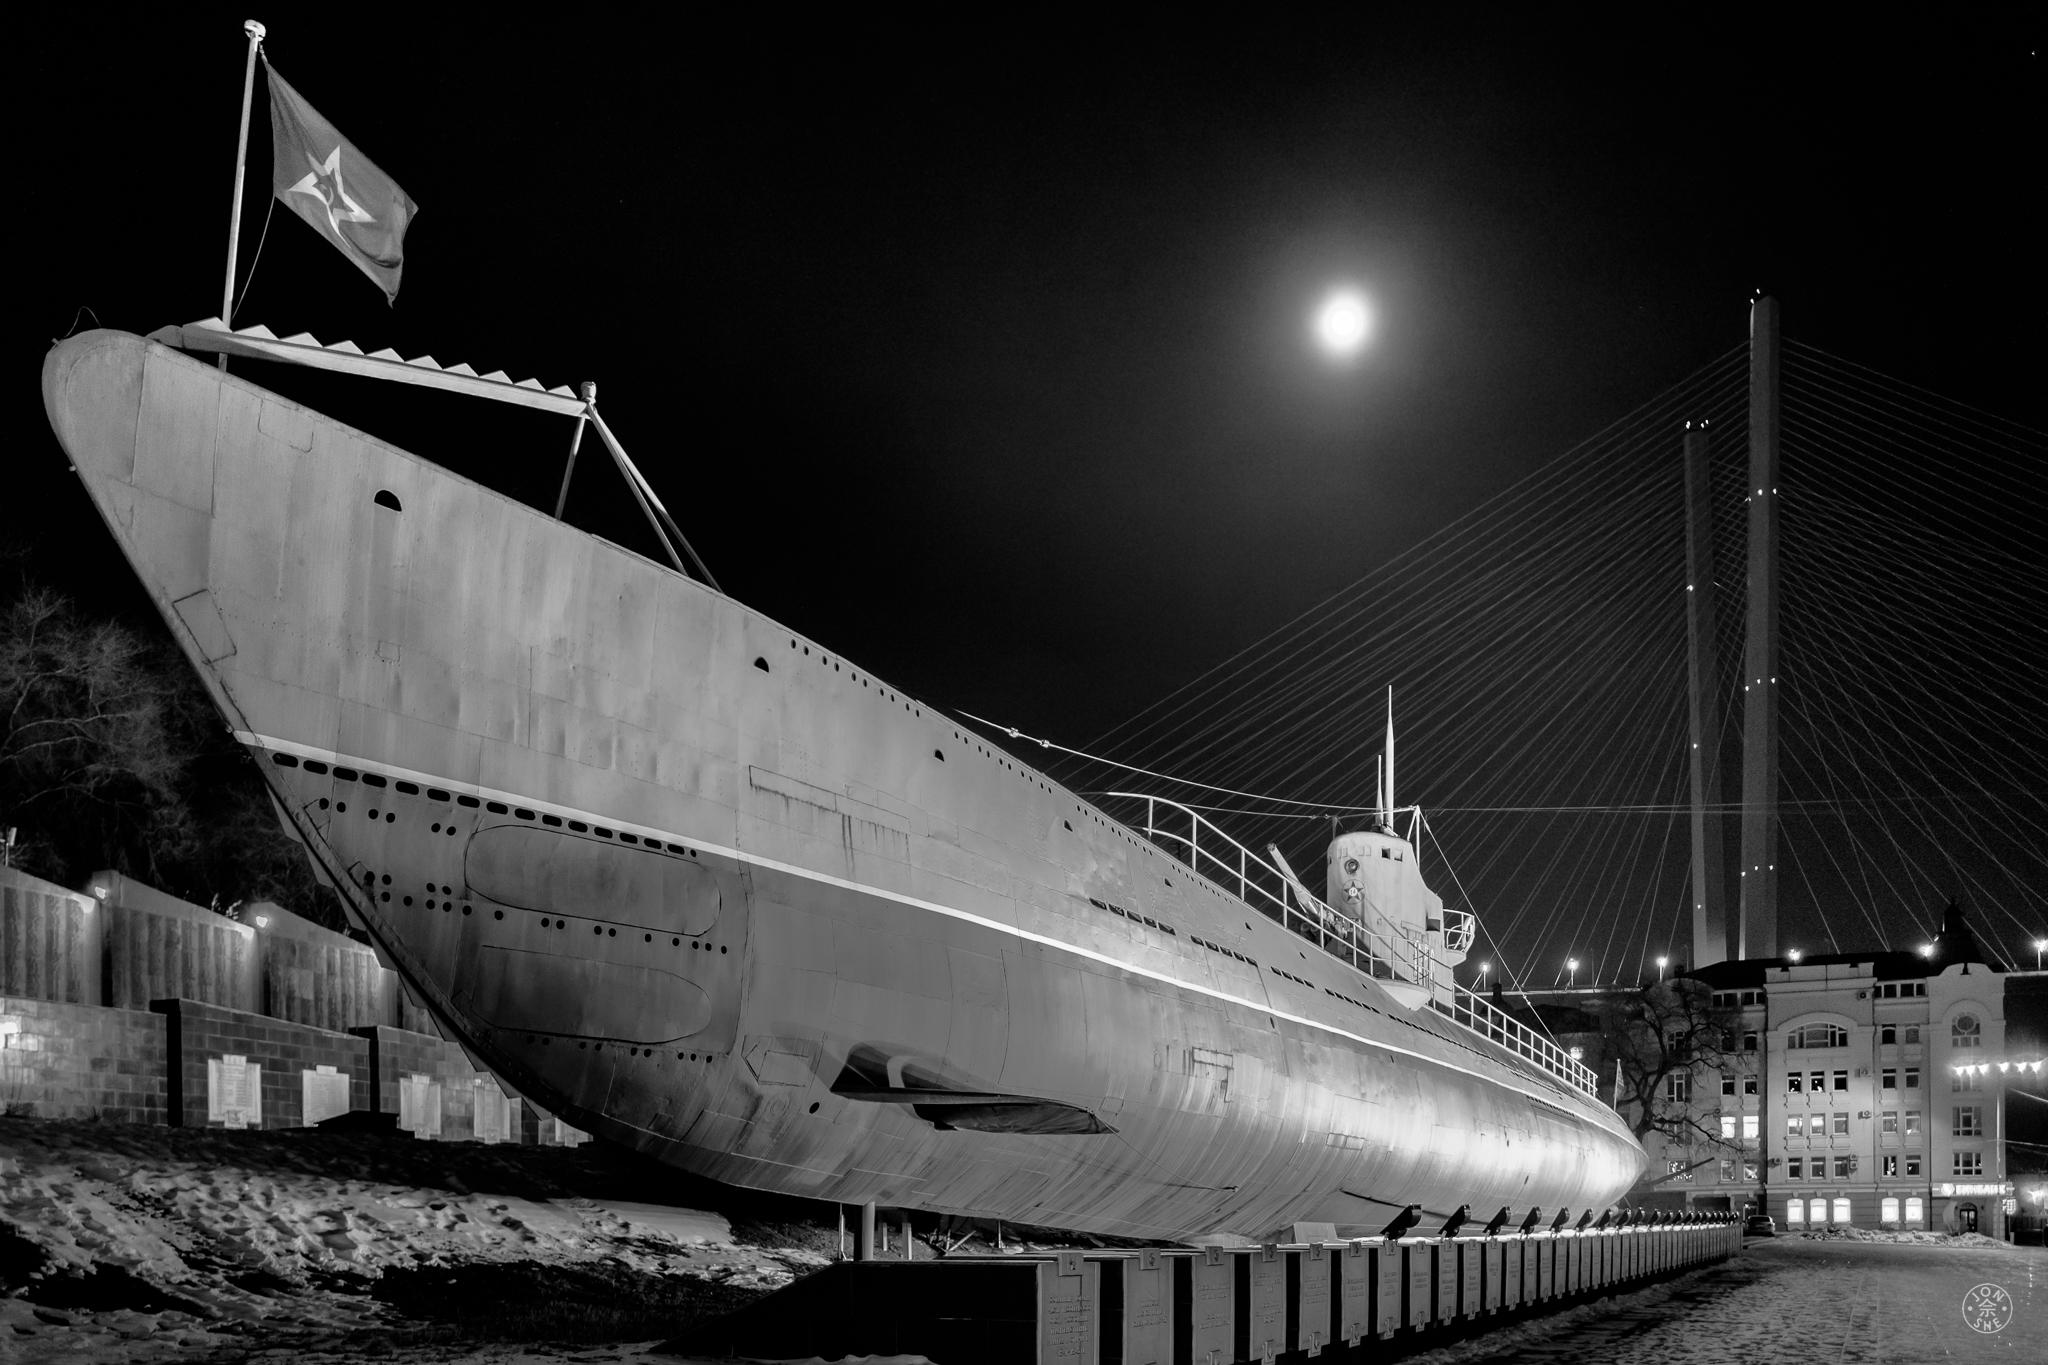 """Midnight Submarine"".  Vladivostok, Primorsky Krai, Far East Russia. January 2017. © Jon She. Leica Q (Typ 116), Leica Summilux 28mm f/1.7 ASPH (FLE)."